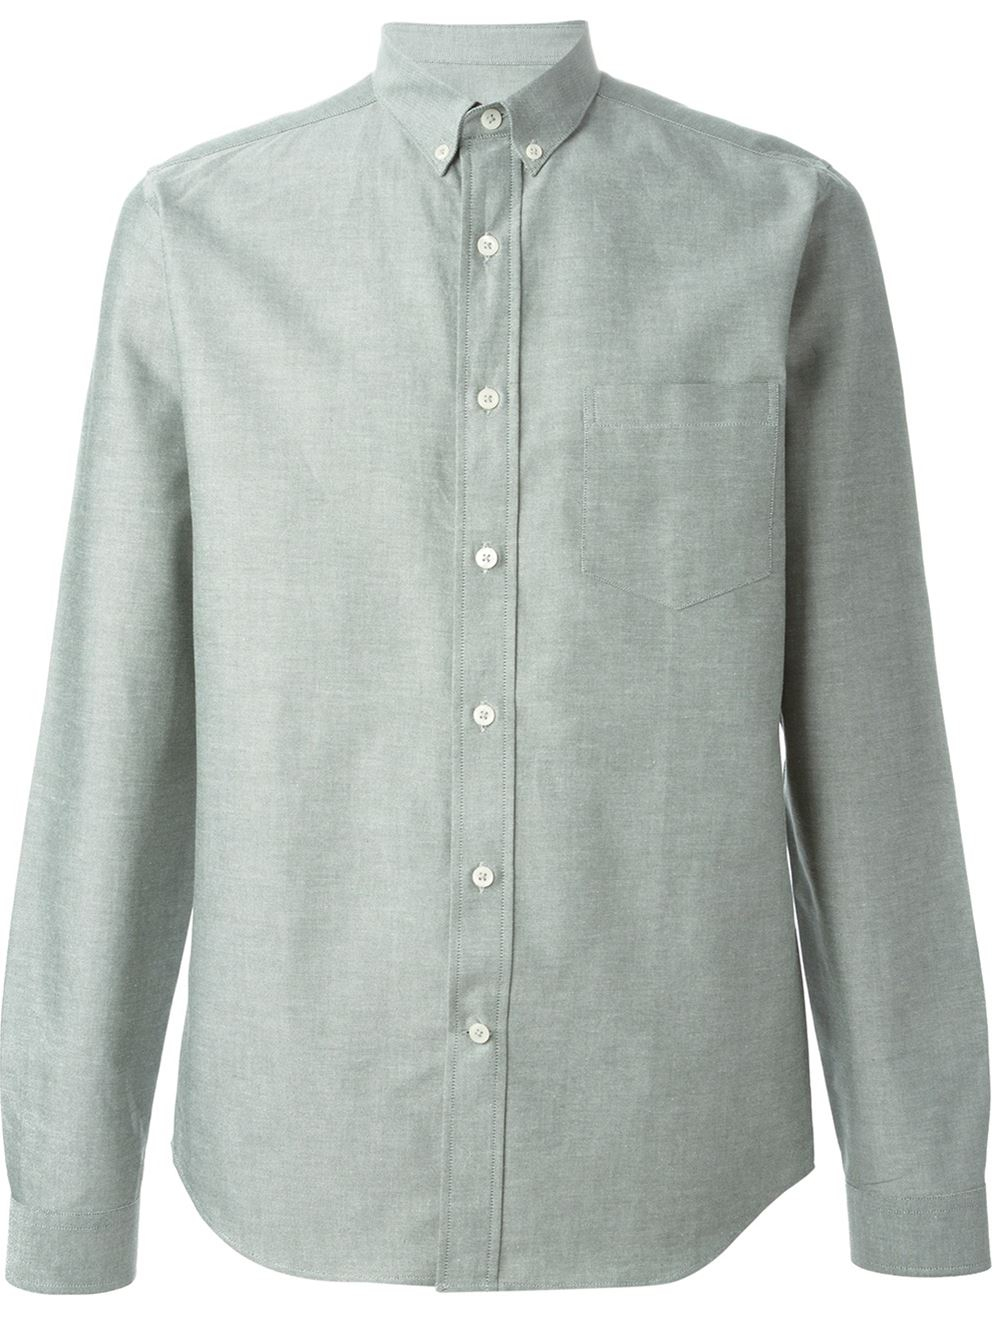 Ami Button Down Collar Shirt In Green For Men Lyst